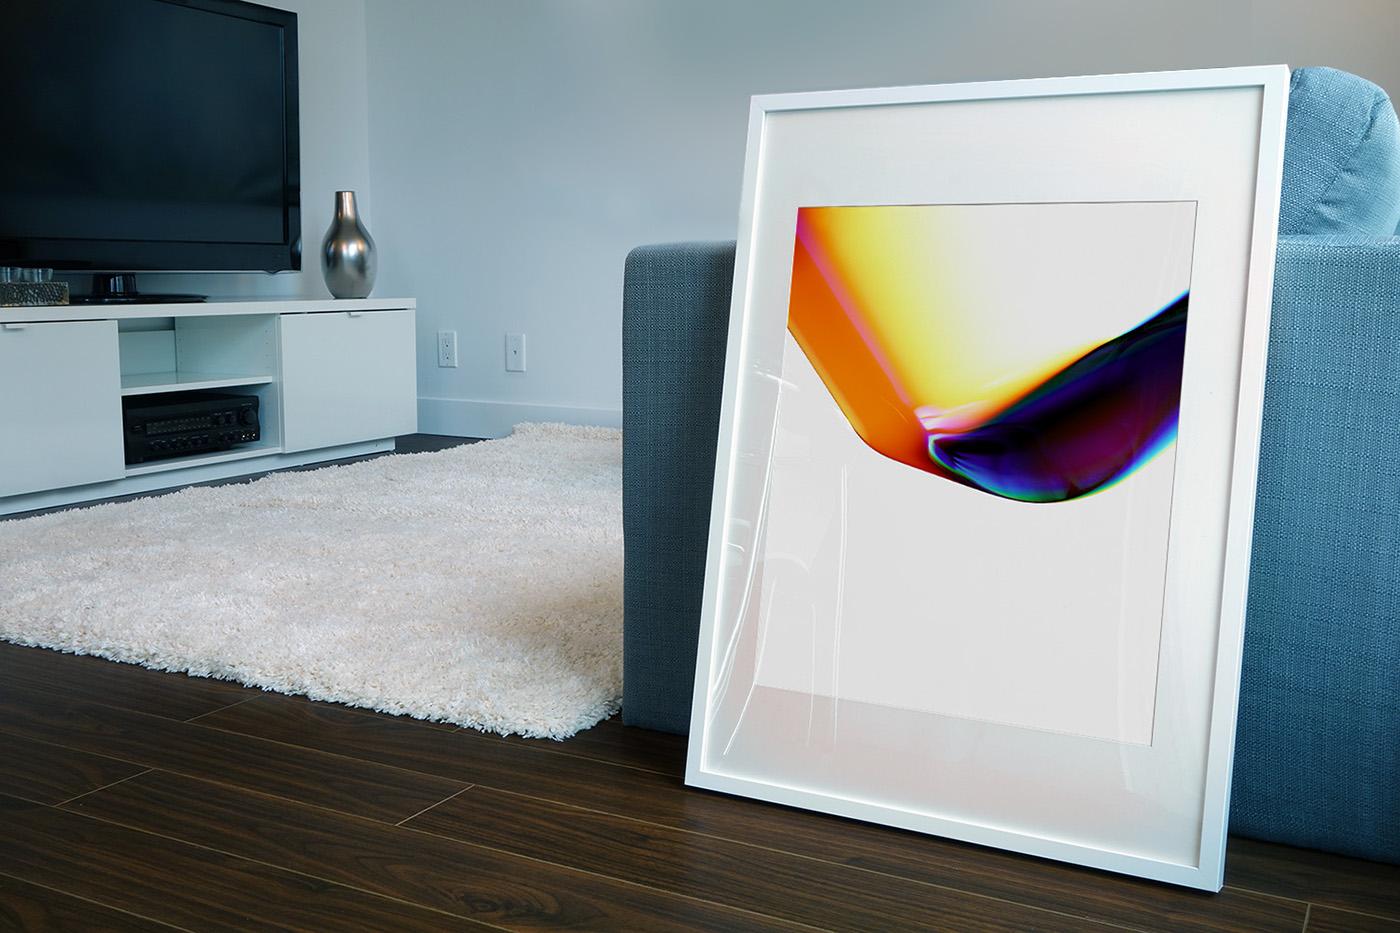 abberation chroma chromatic shane griffin abstract color Beautiful prisim rainbow